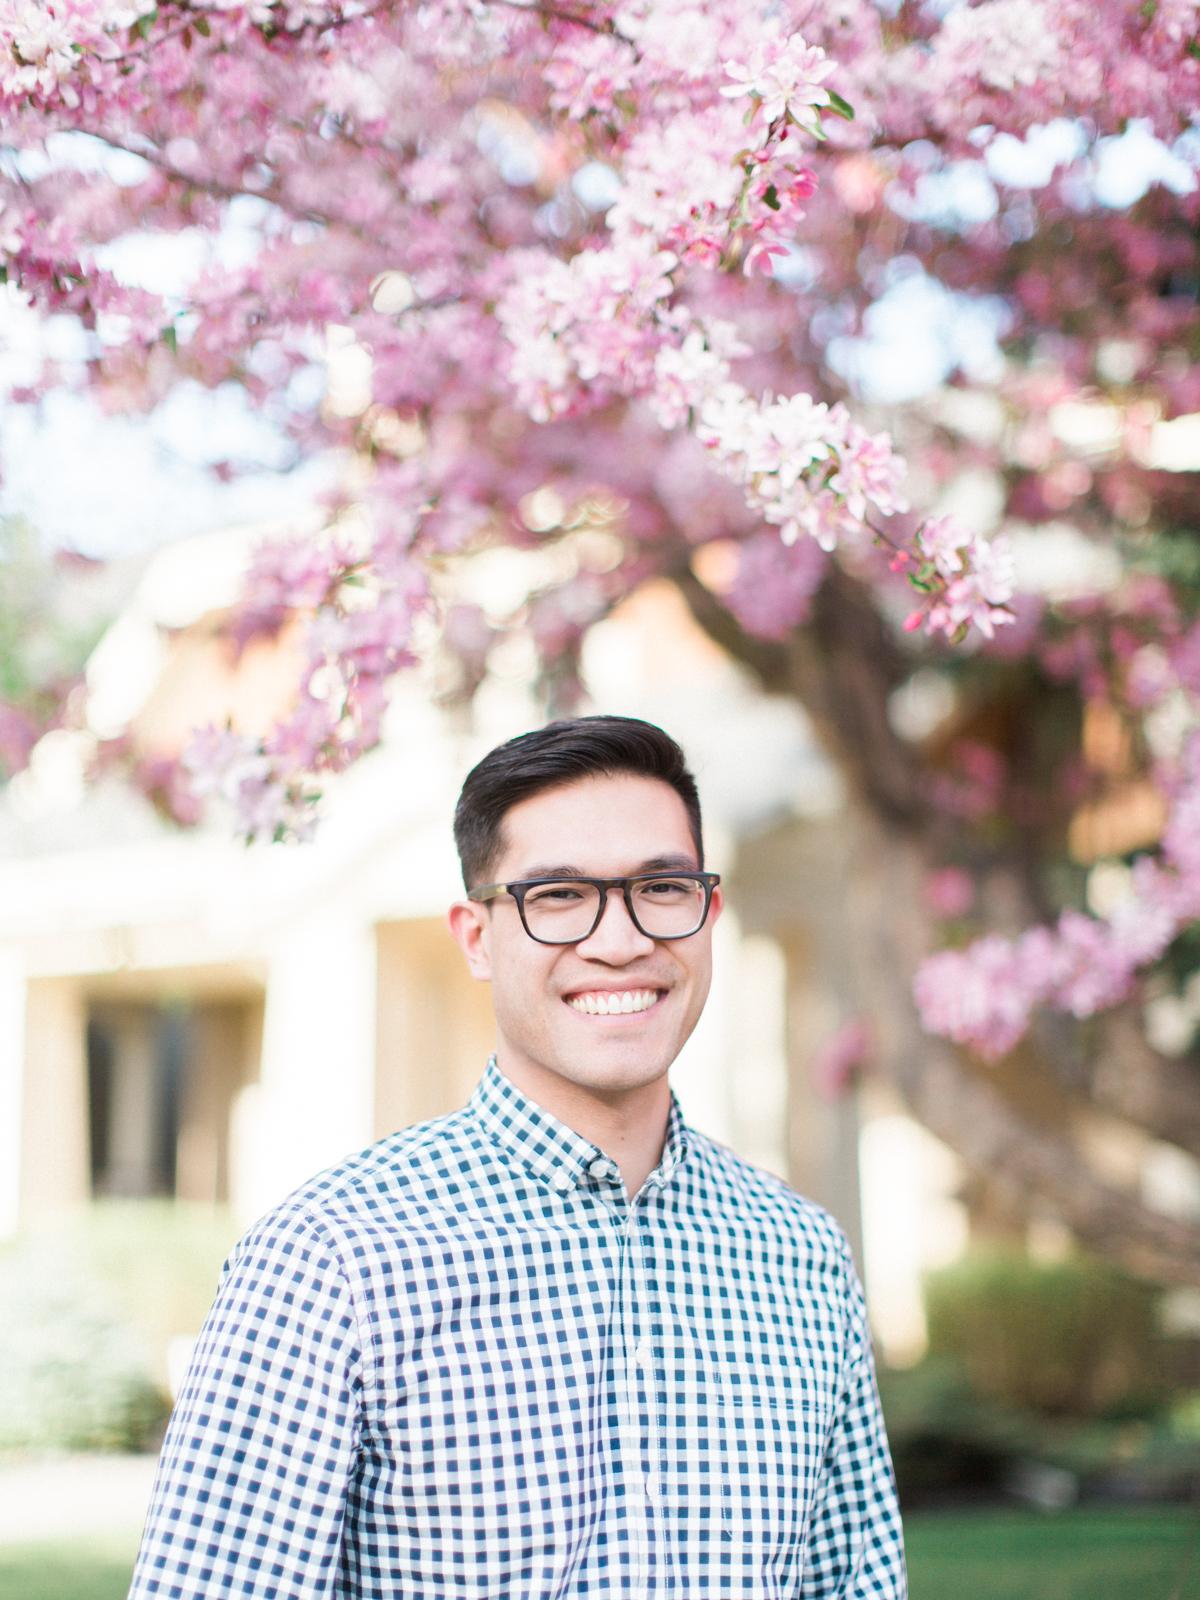 Calgary-wedding Photography-spring-engagement-cherry-tree-guy.jpg